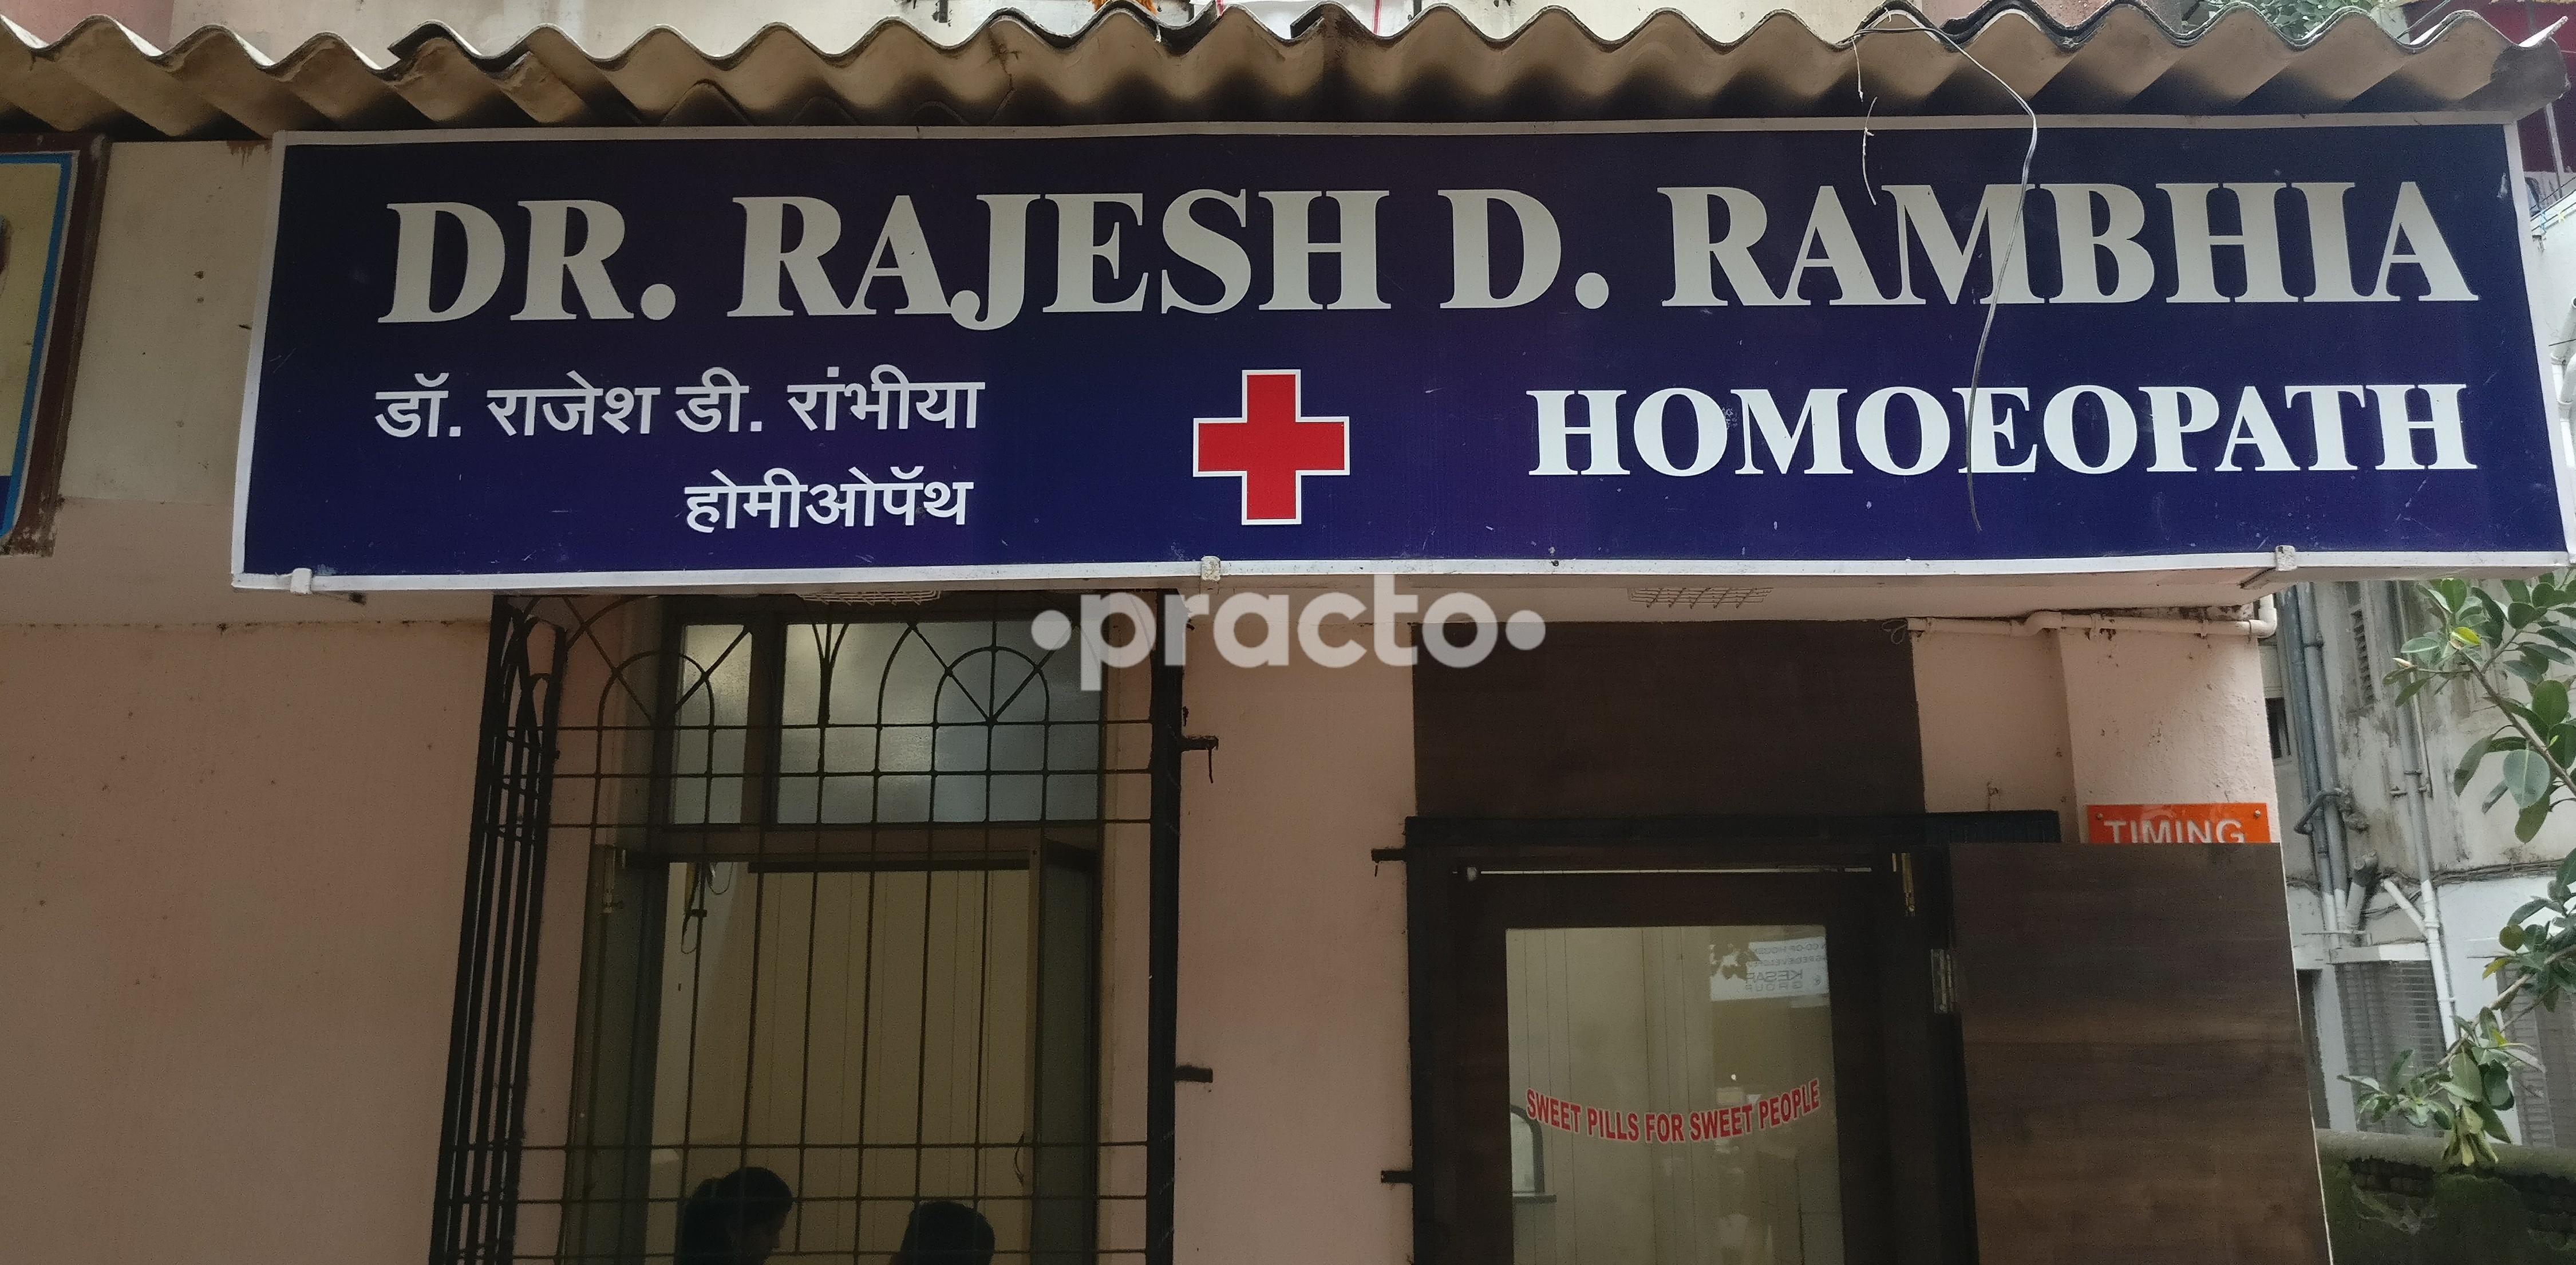 Dr. Rambhia's Homoeopathic Clinic